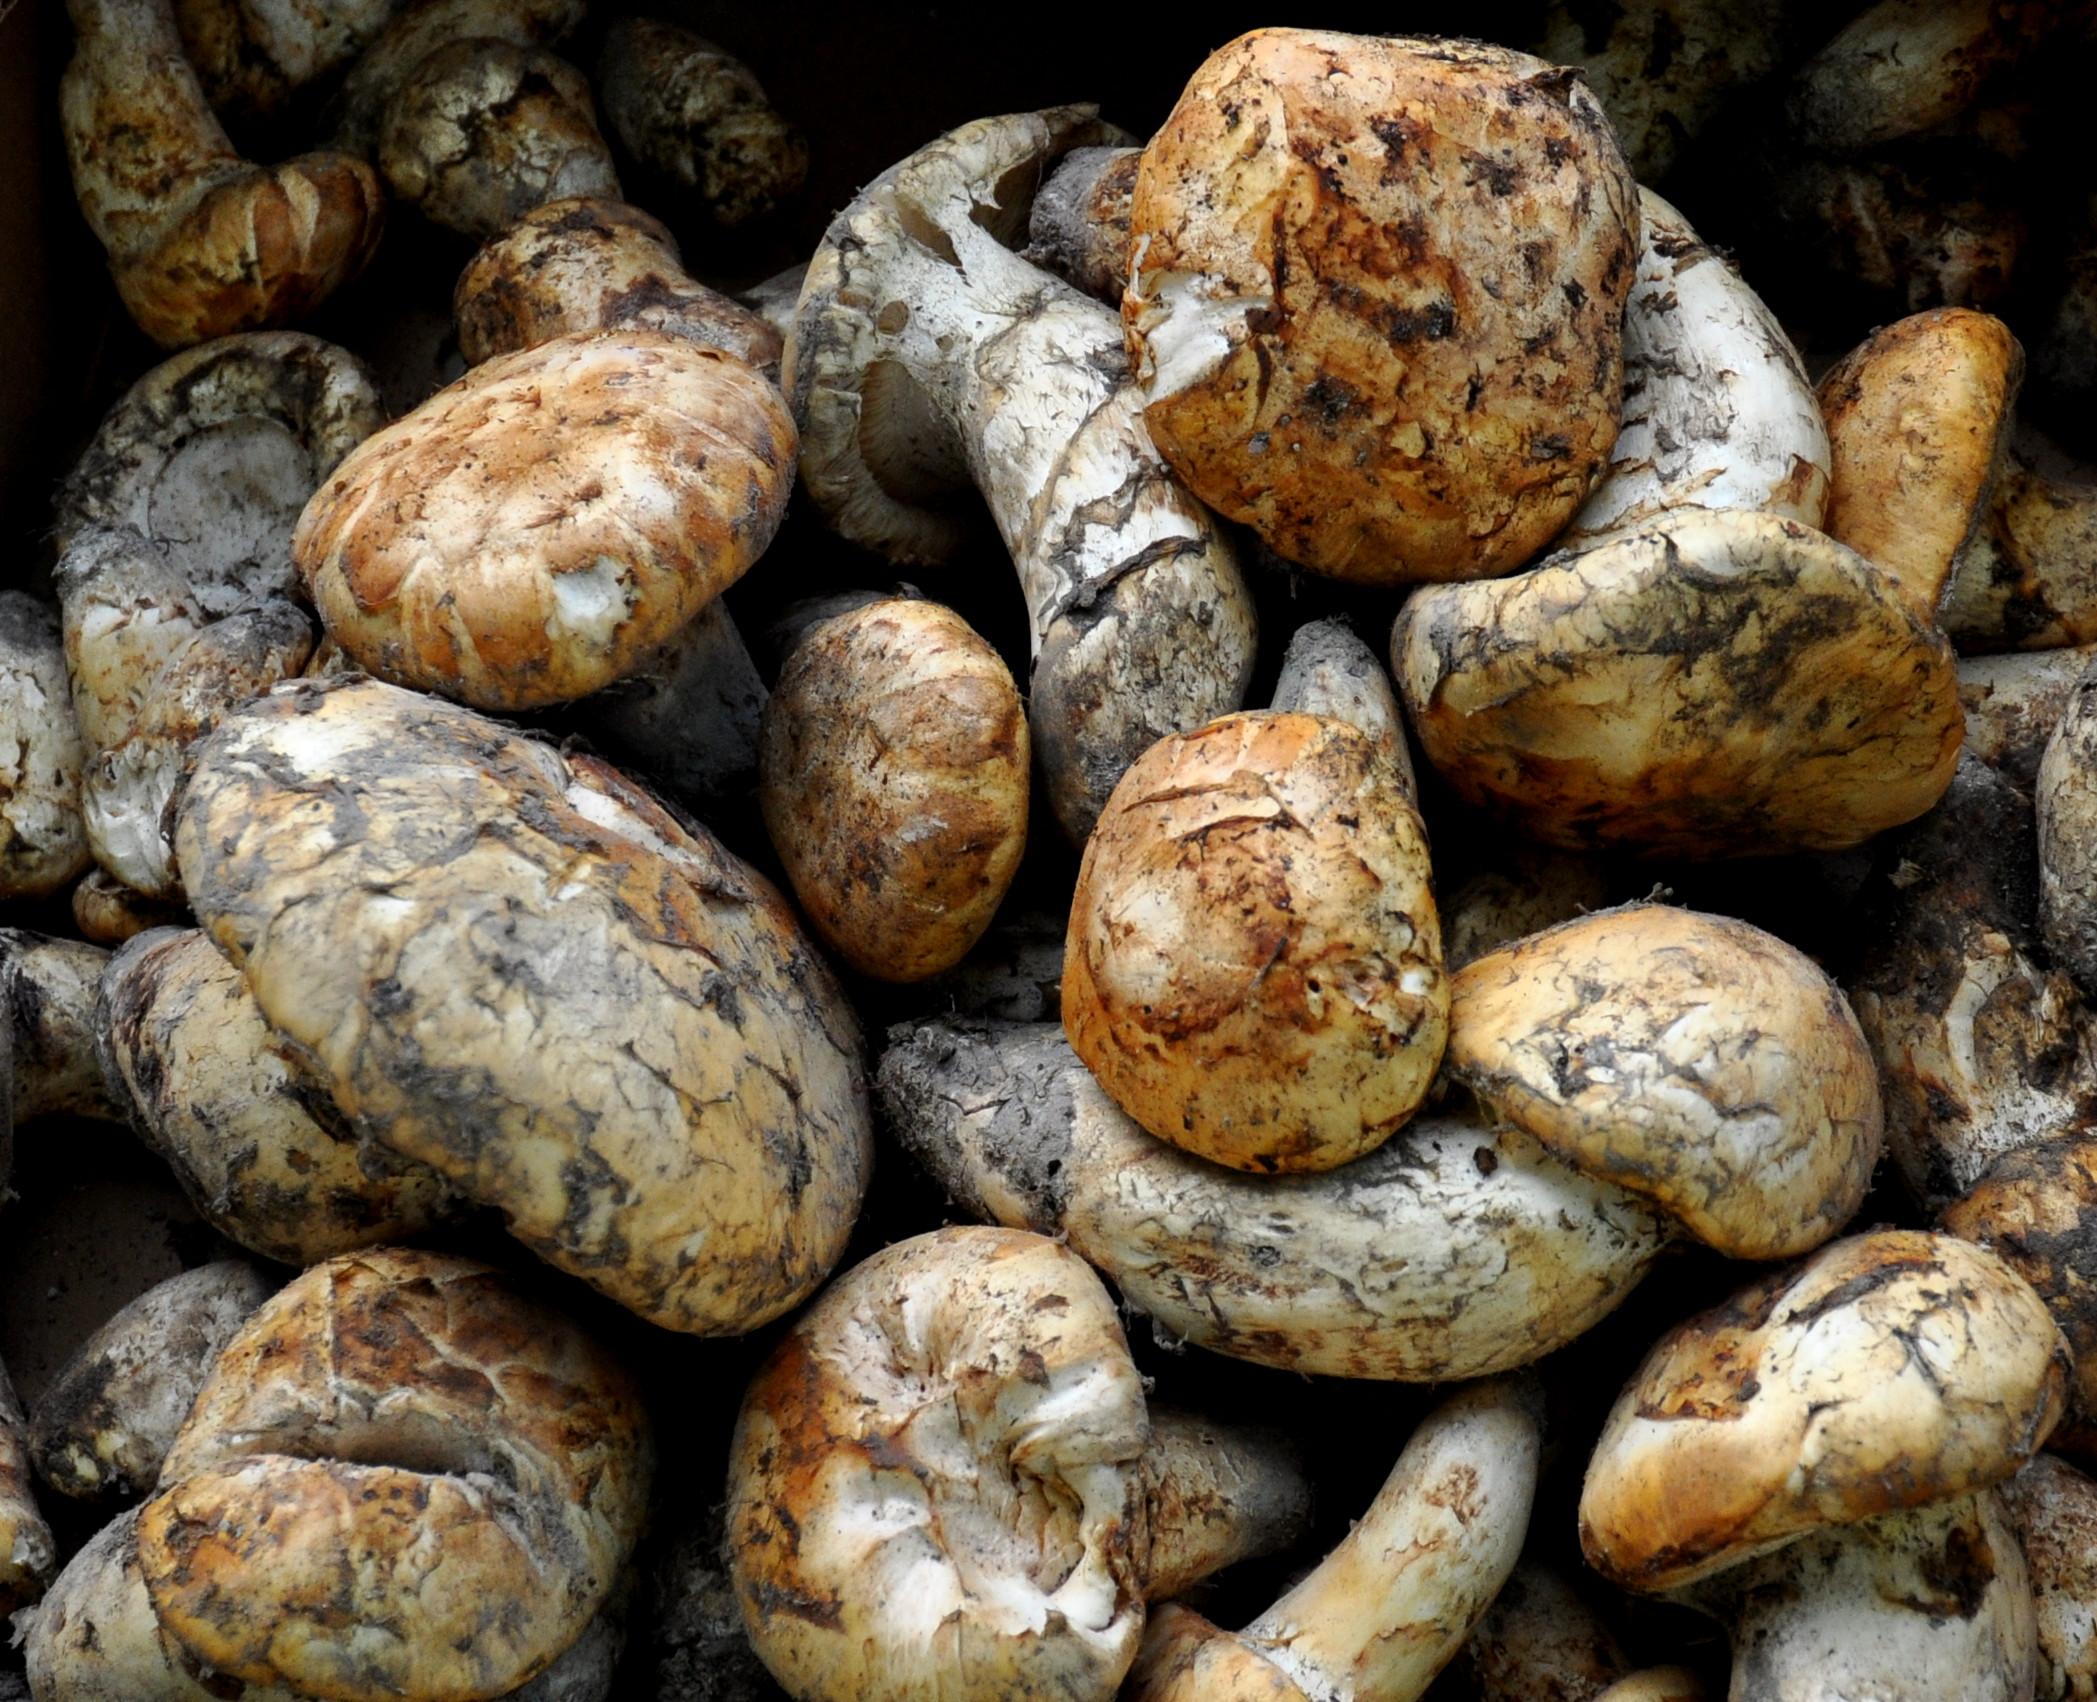 Wild matsutake mushrooms from Foraged & Food Edibles at Ballard Farmers Market. Copyright Zachary D. Lyons.